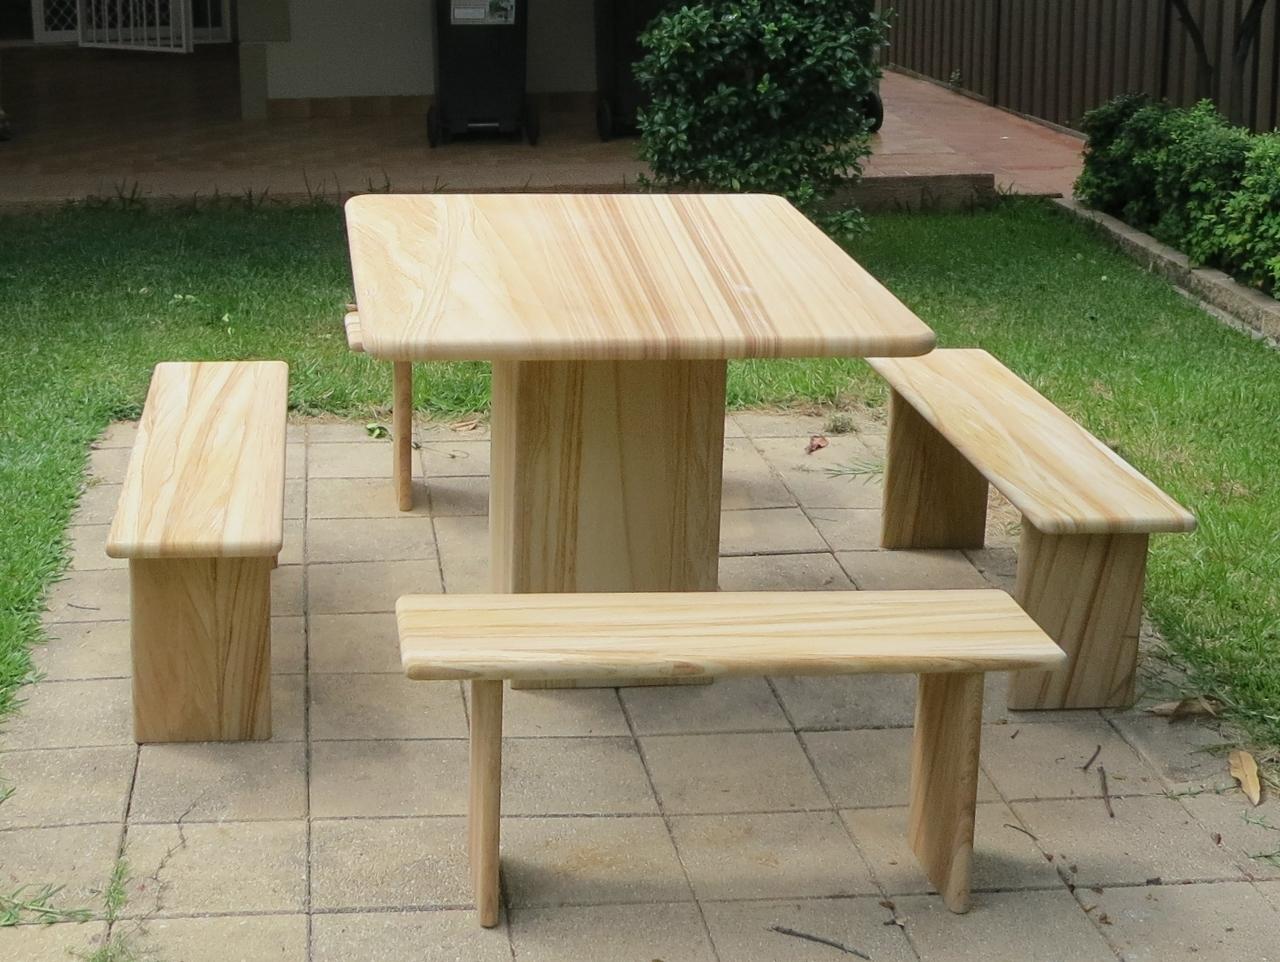 210 Woodgrain sandstone garden furniture custom made.jpg